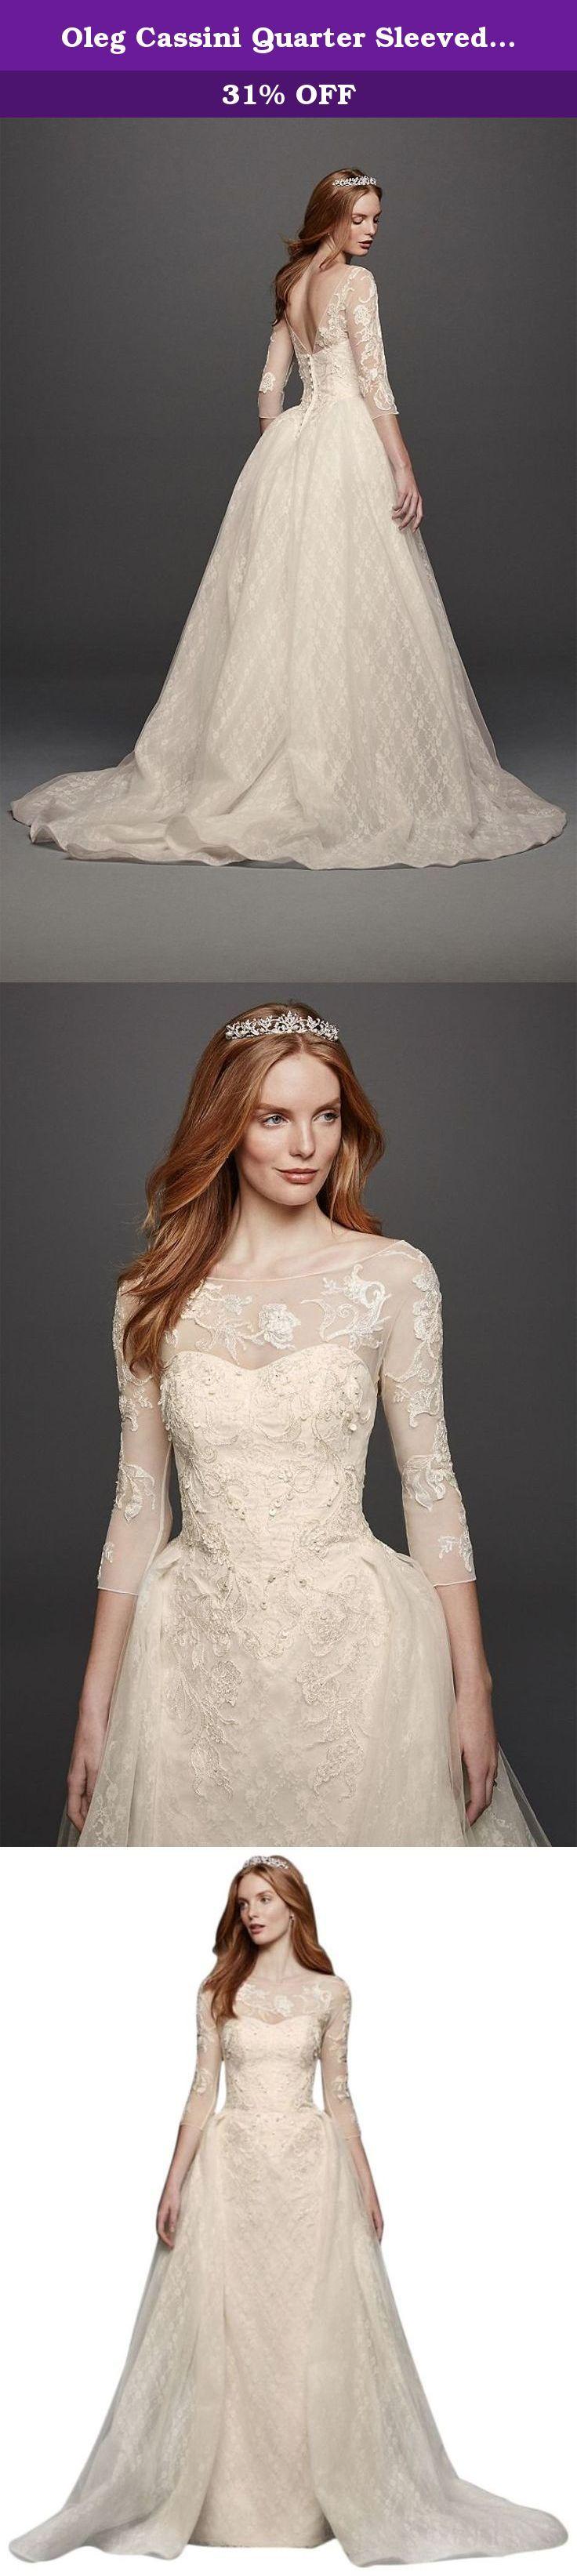 Diy wedding dress preservation wedding dresses asian for Why preserve wedding dress